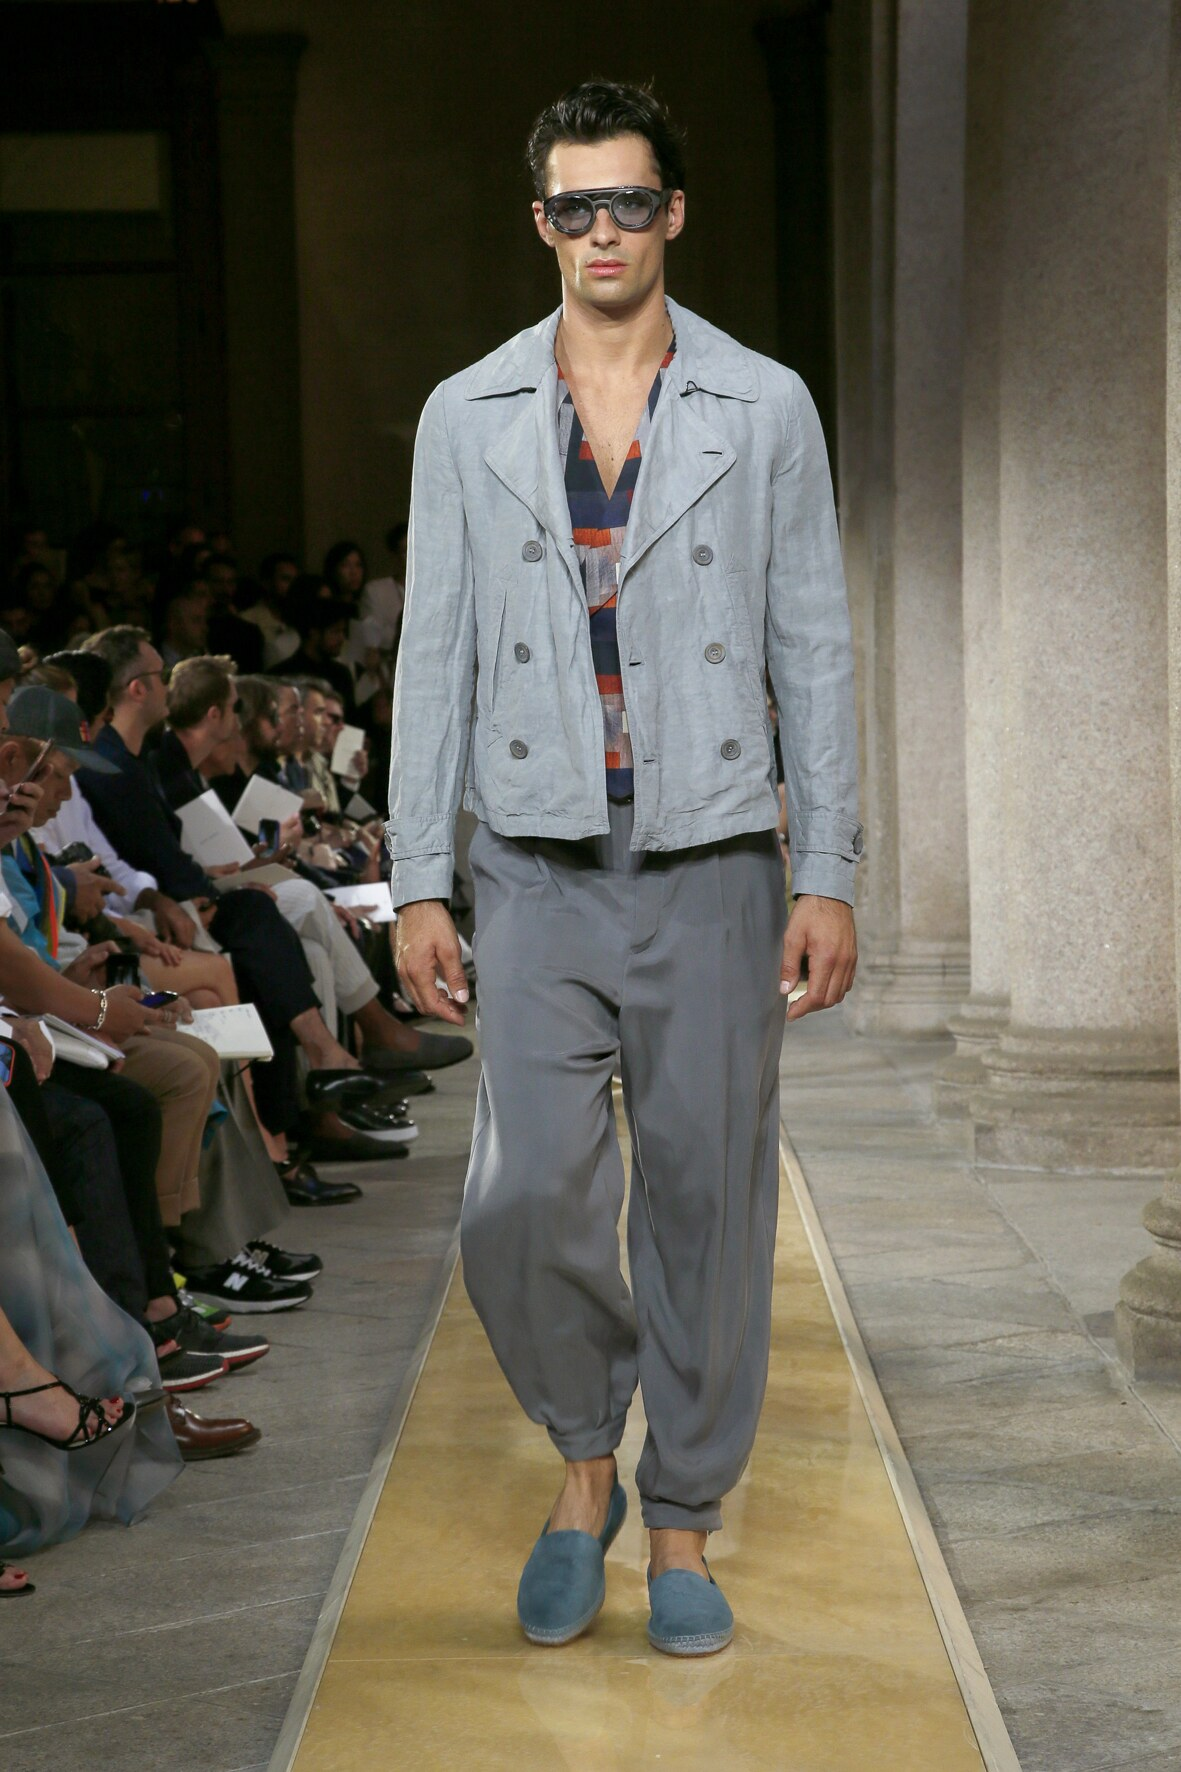 Fashion 2020 Runway Giorgio Armani SS